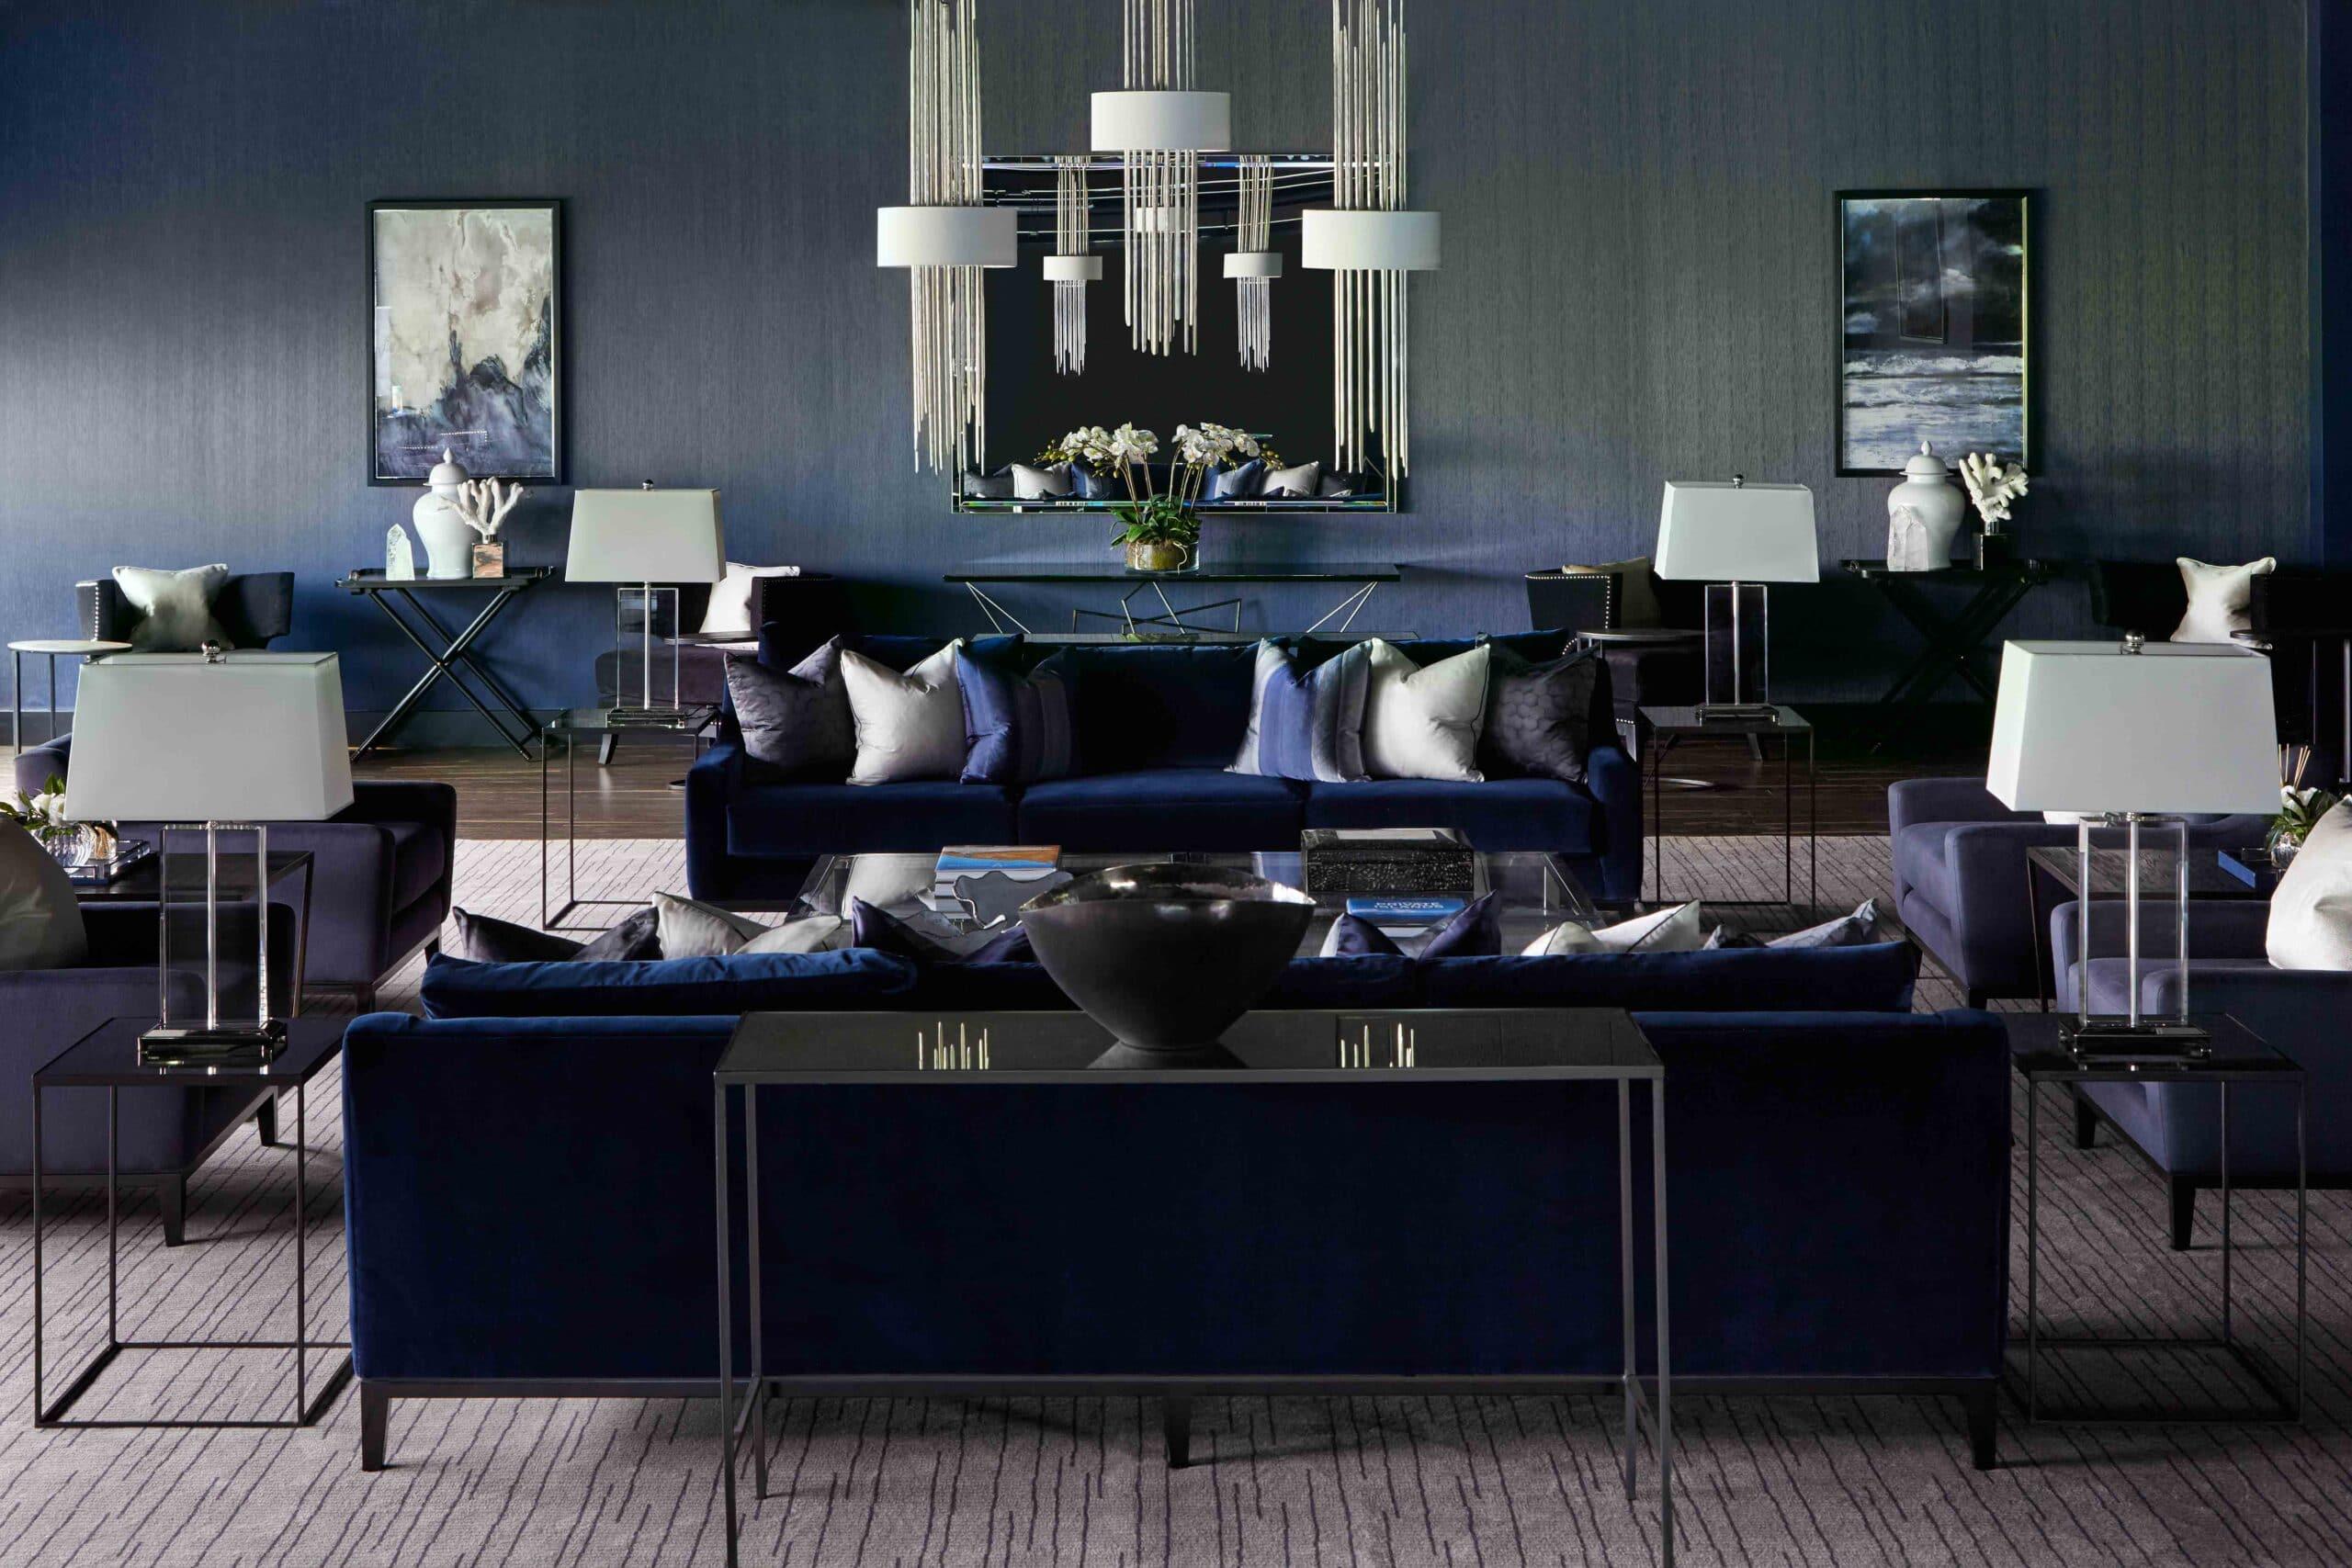 Private jet lounge interior design project